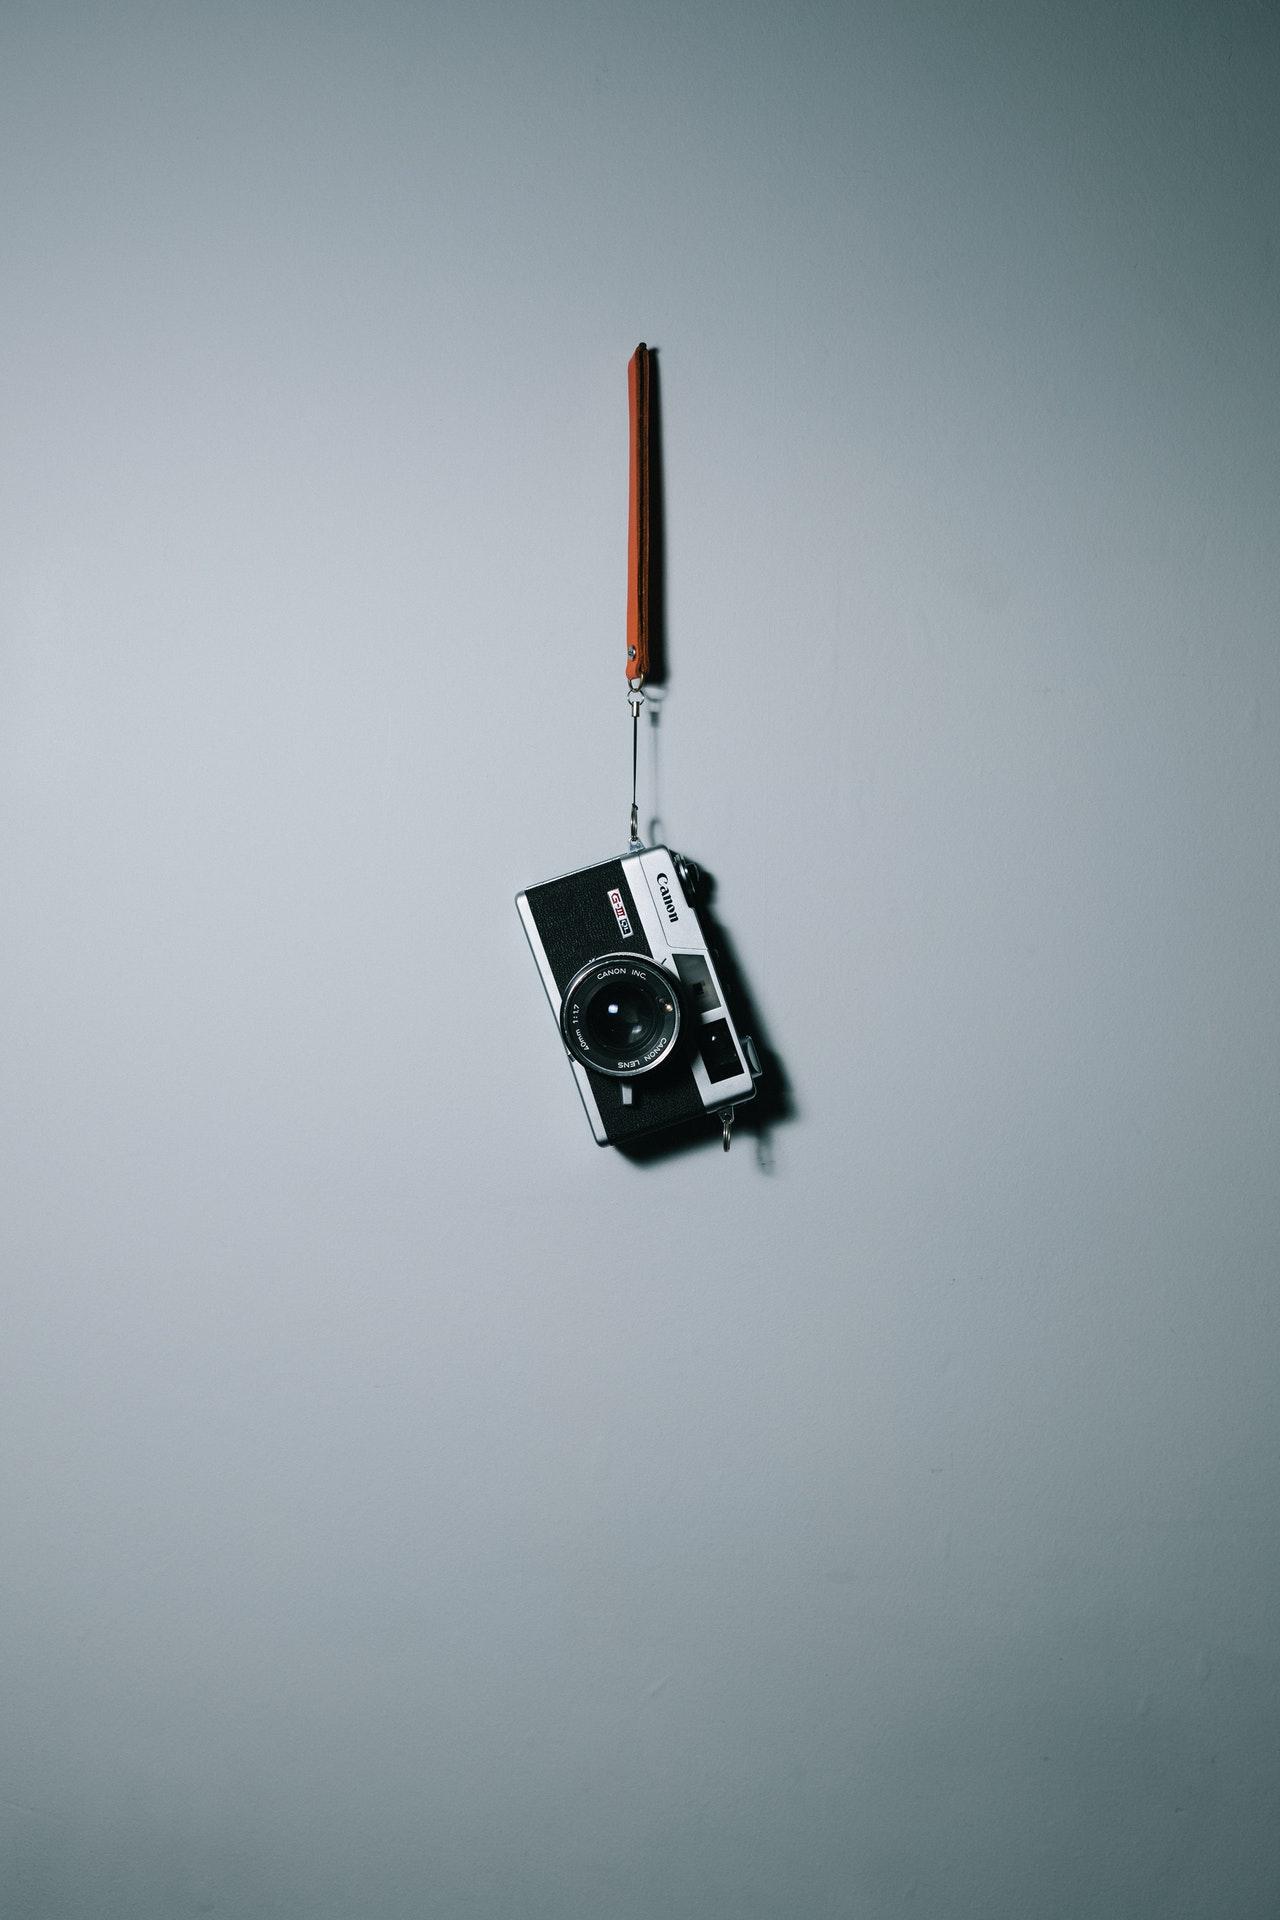 photography vintage analog camera canon